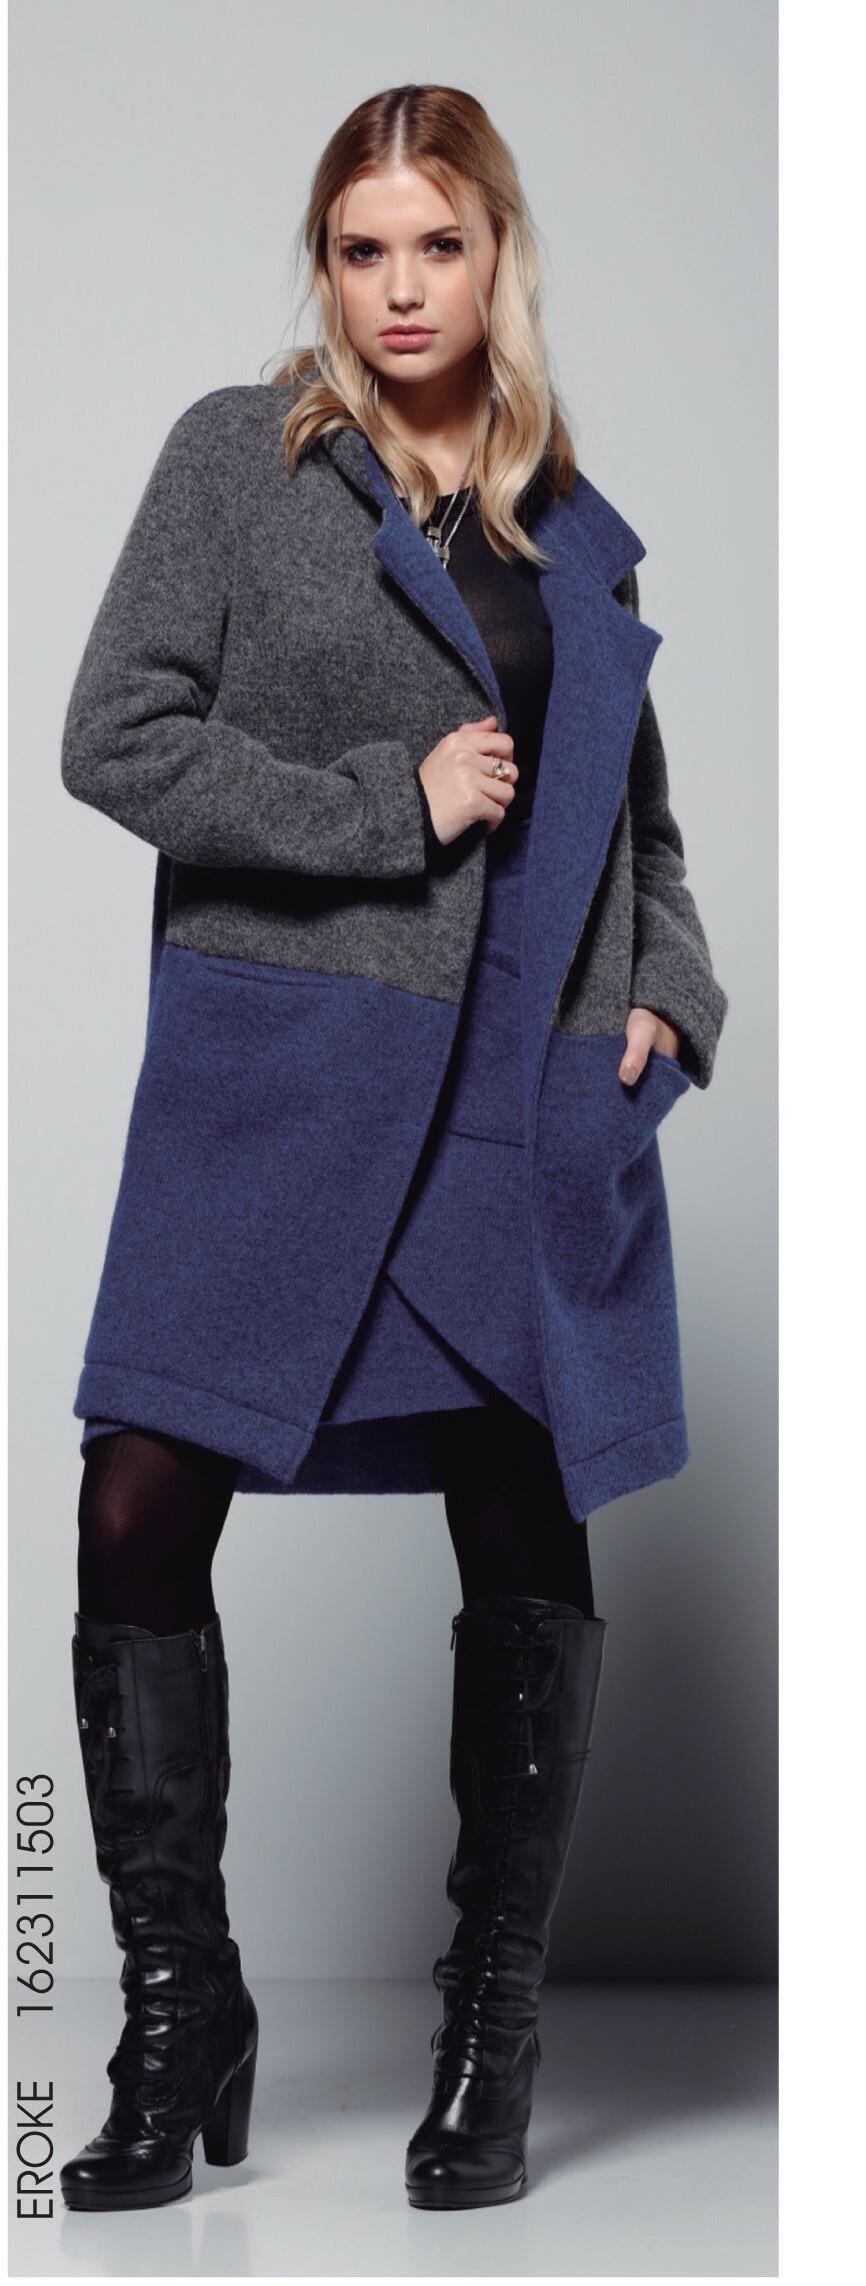 Maloka: Double Color Crushed Wool Teddy Coat (1 Left!) MK_EROKE_N